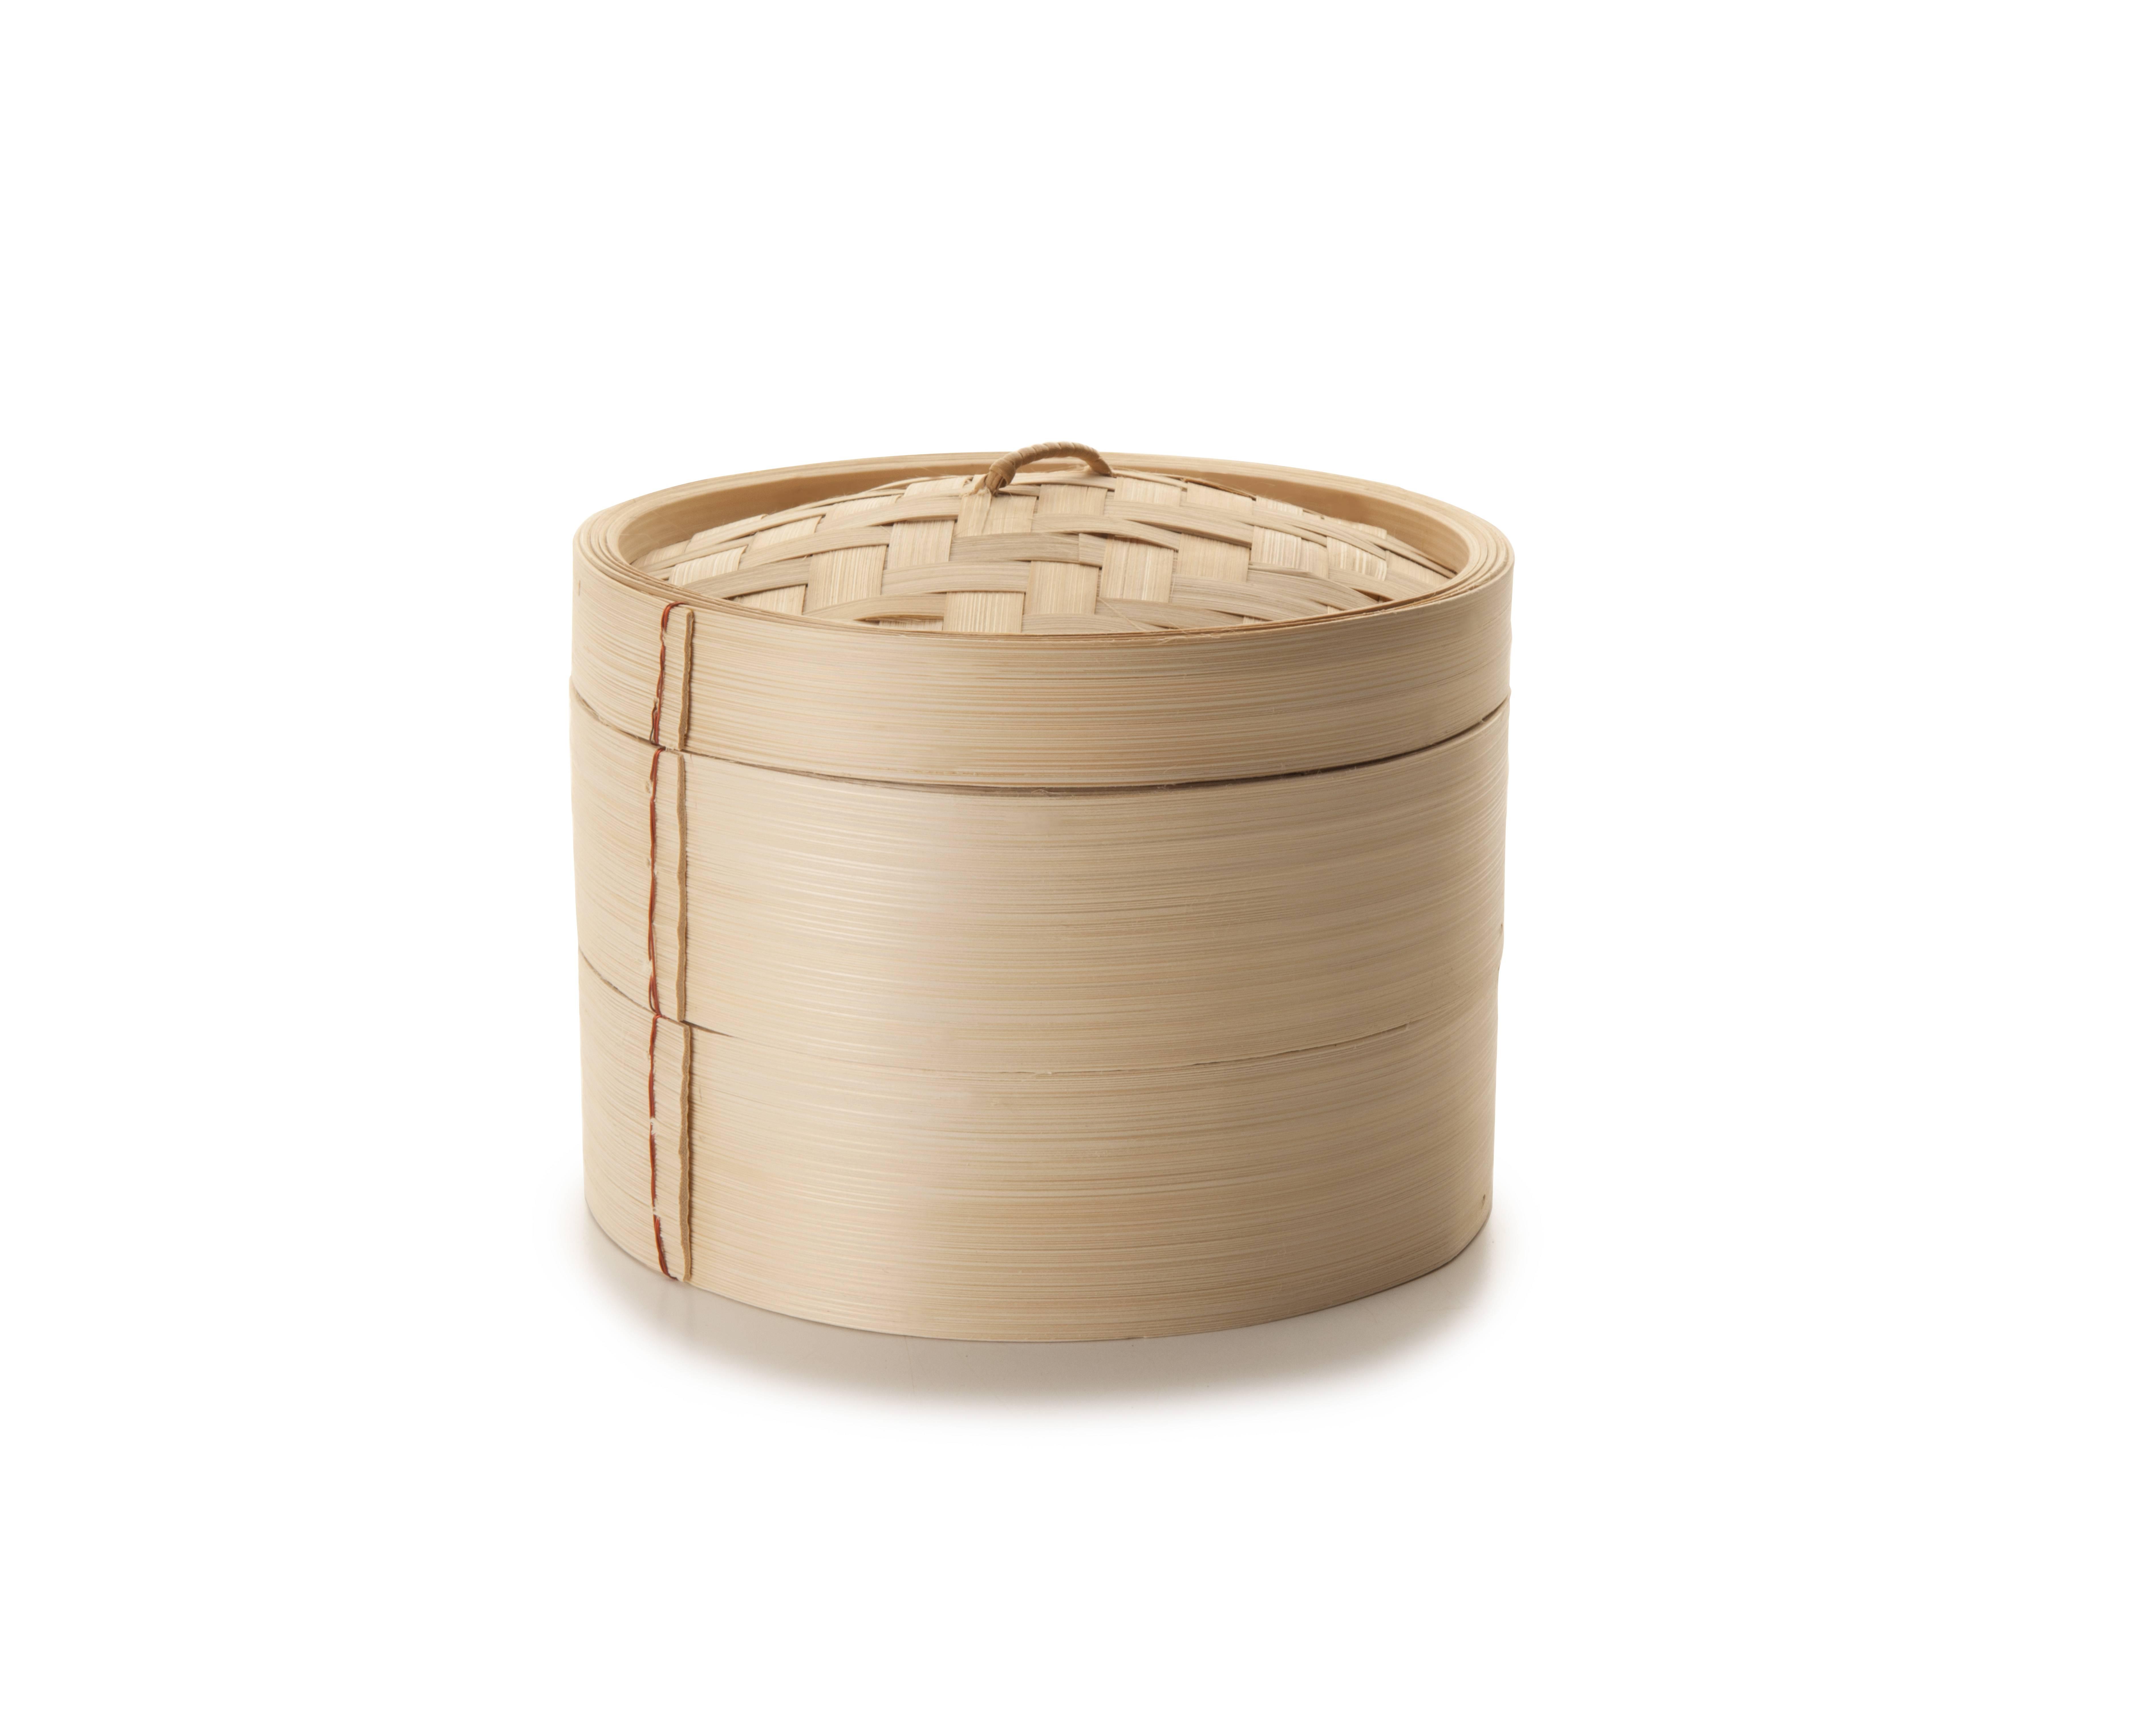 Bambusový pařník mini 10cm - Ibili